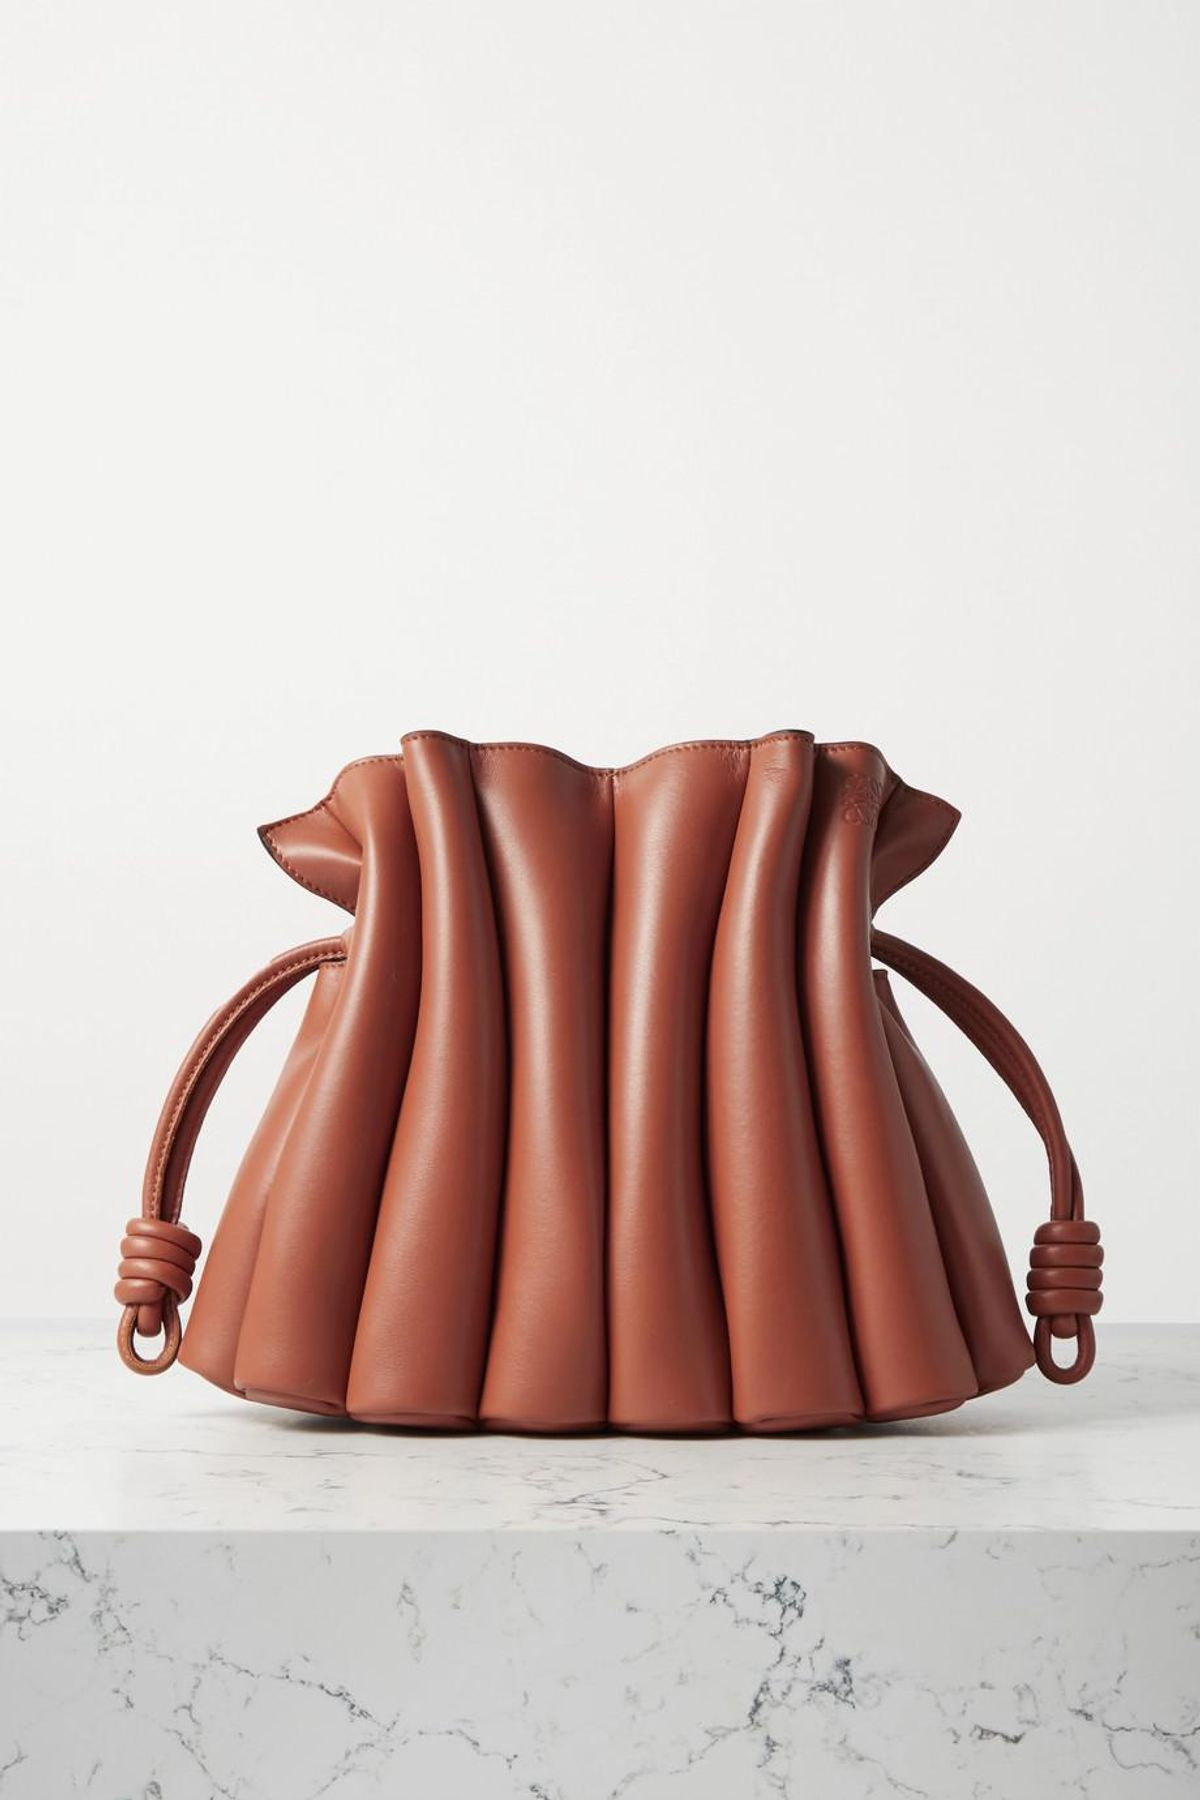 Flamenco Ondas Pleated Leather Clutch